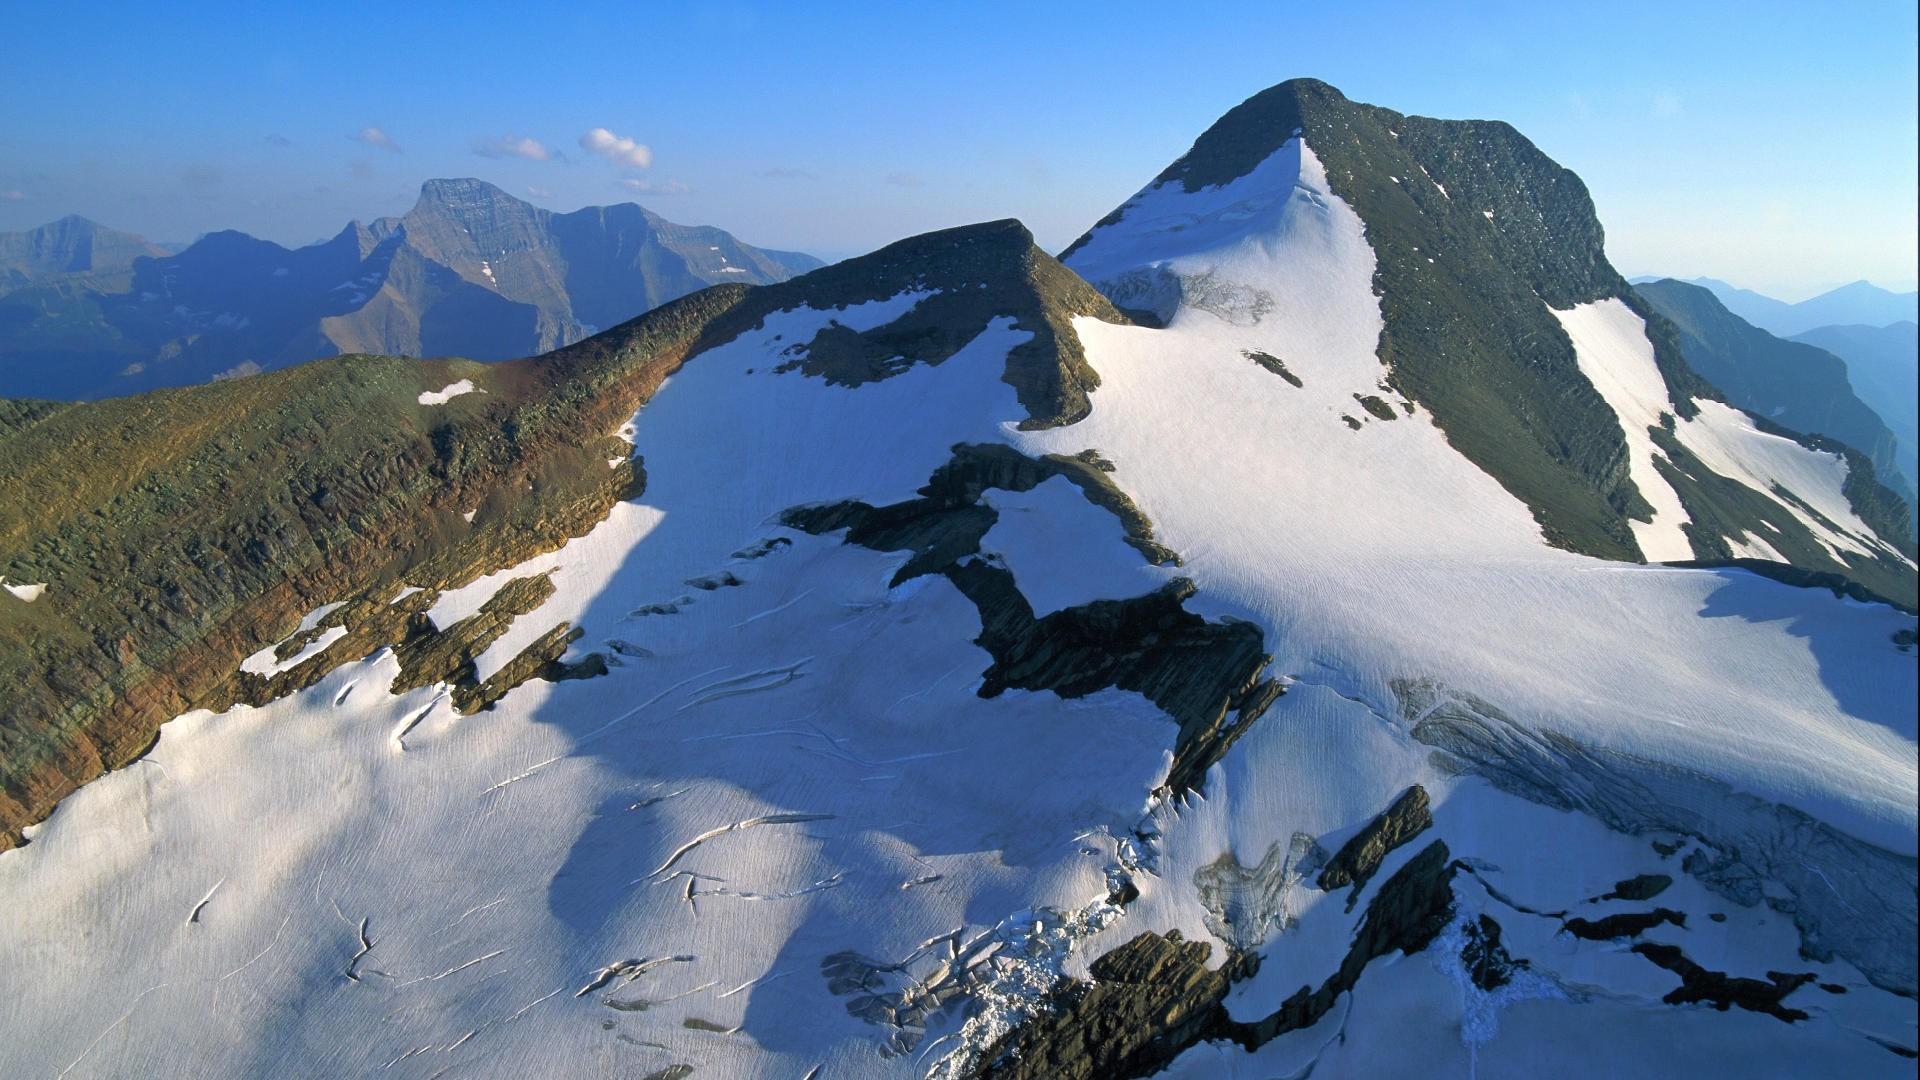 glacier mountain images